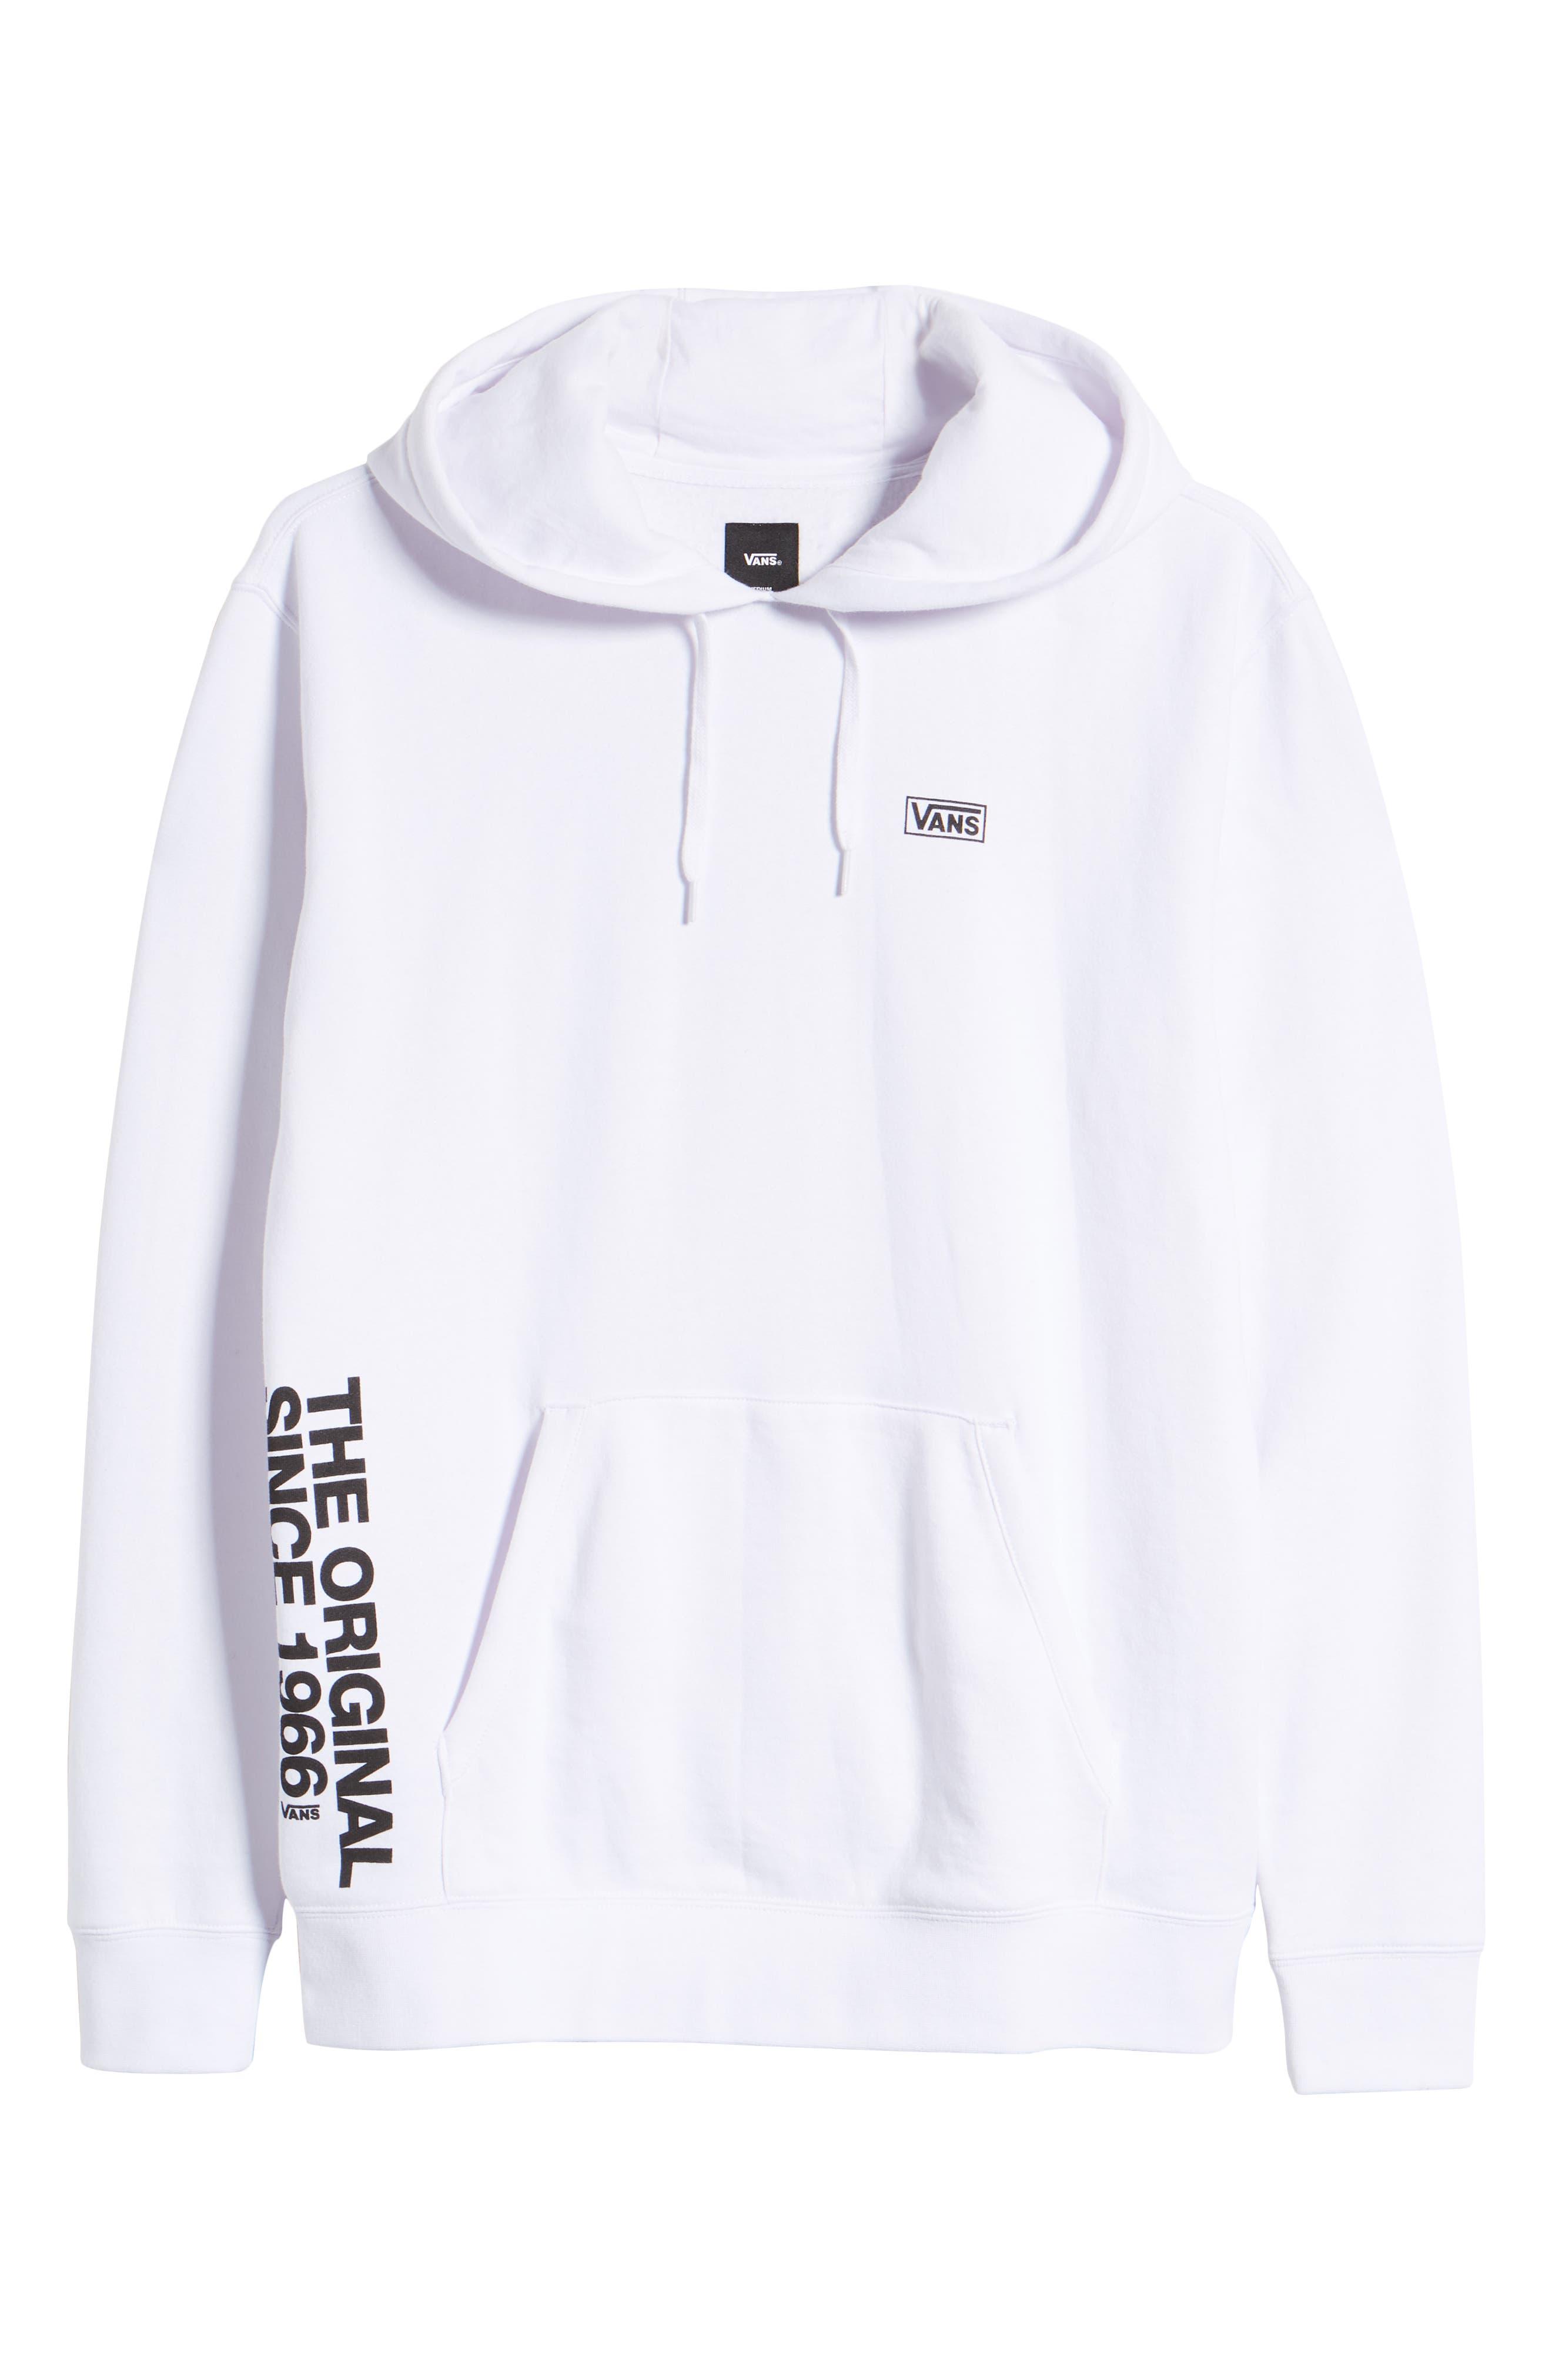 VANS, Off the Wall Distort Hooded Sweatshirt, Alternate thumbnail 6, color, WHITE